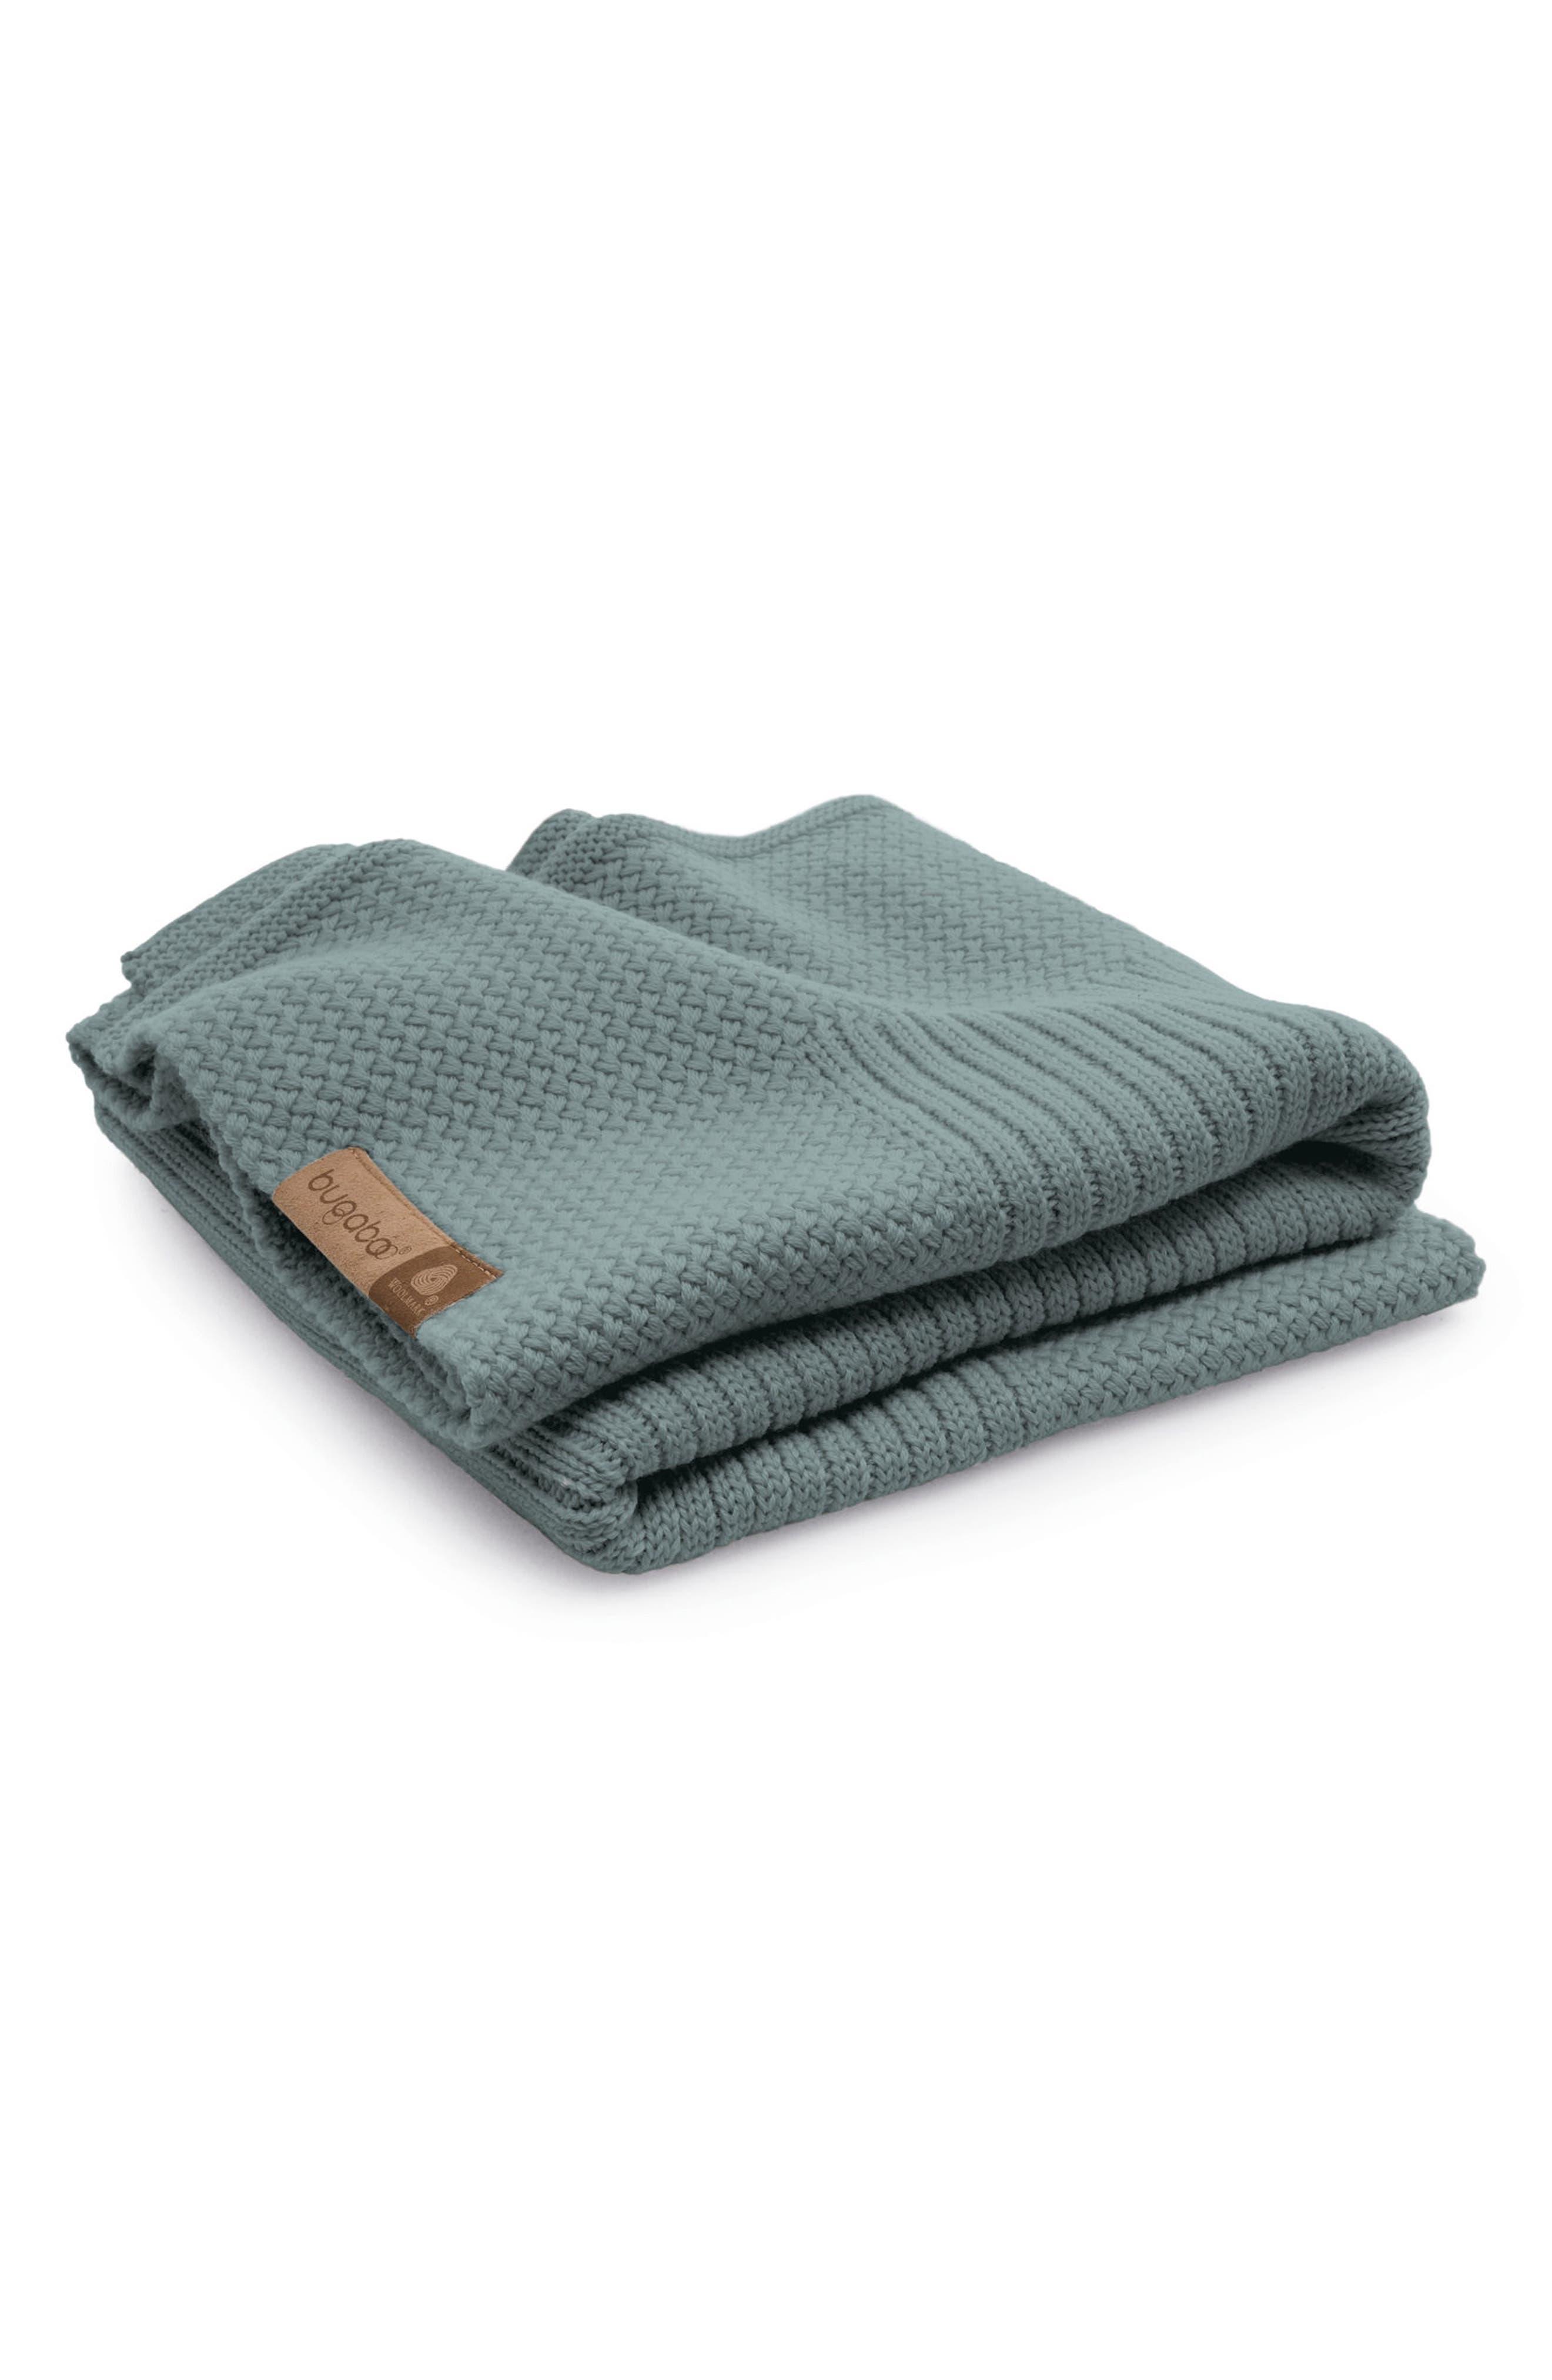 Soft Wool Blanket,                         Main,                         color, PETROL BLUE